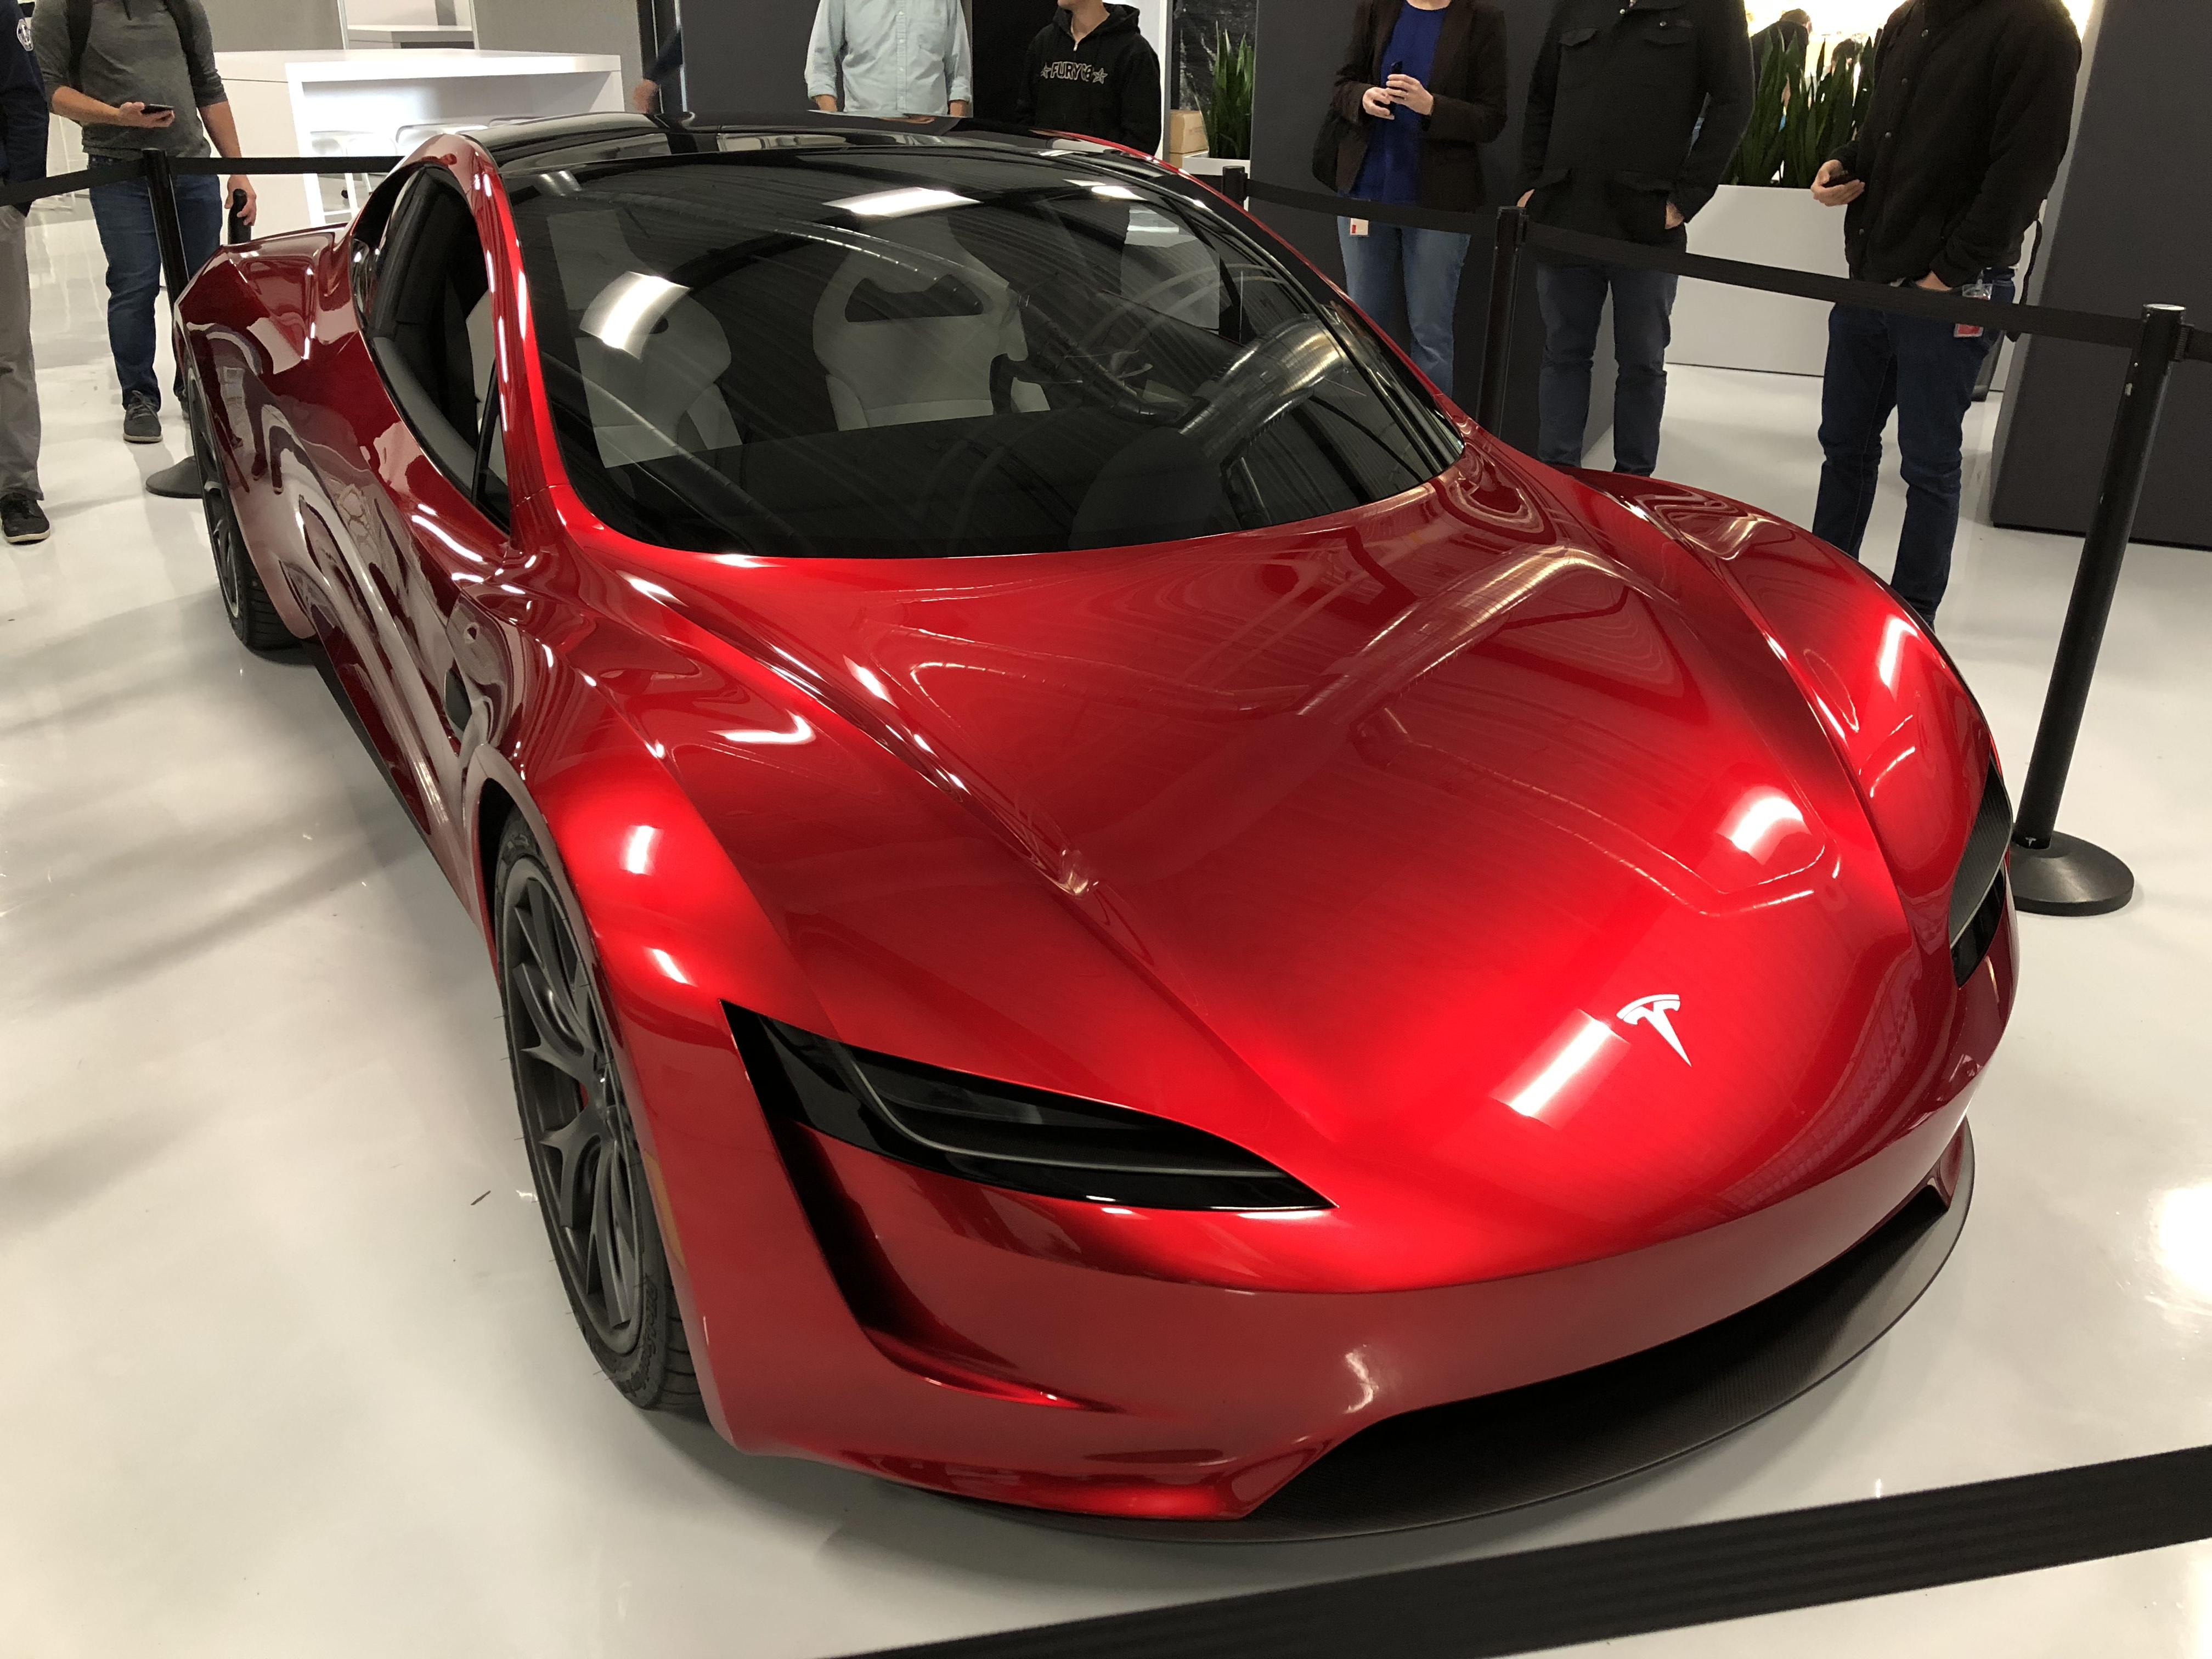 Red Tesla Roadster Palo Alto Hq Teslarati Com